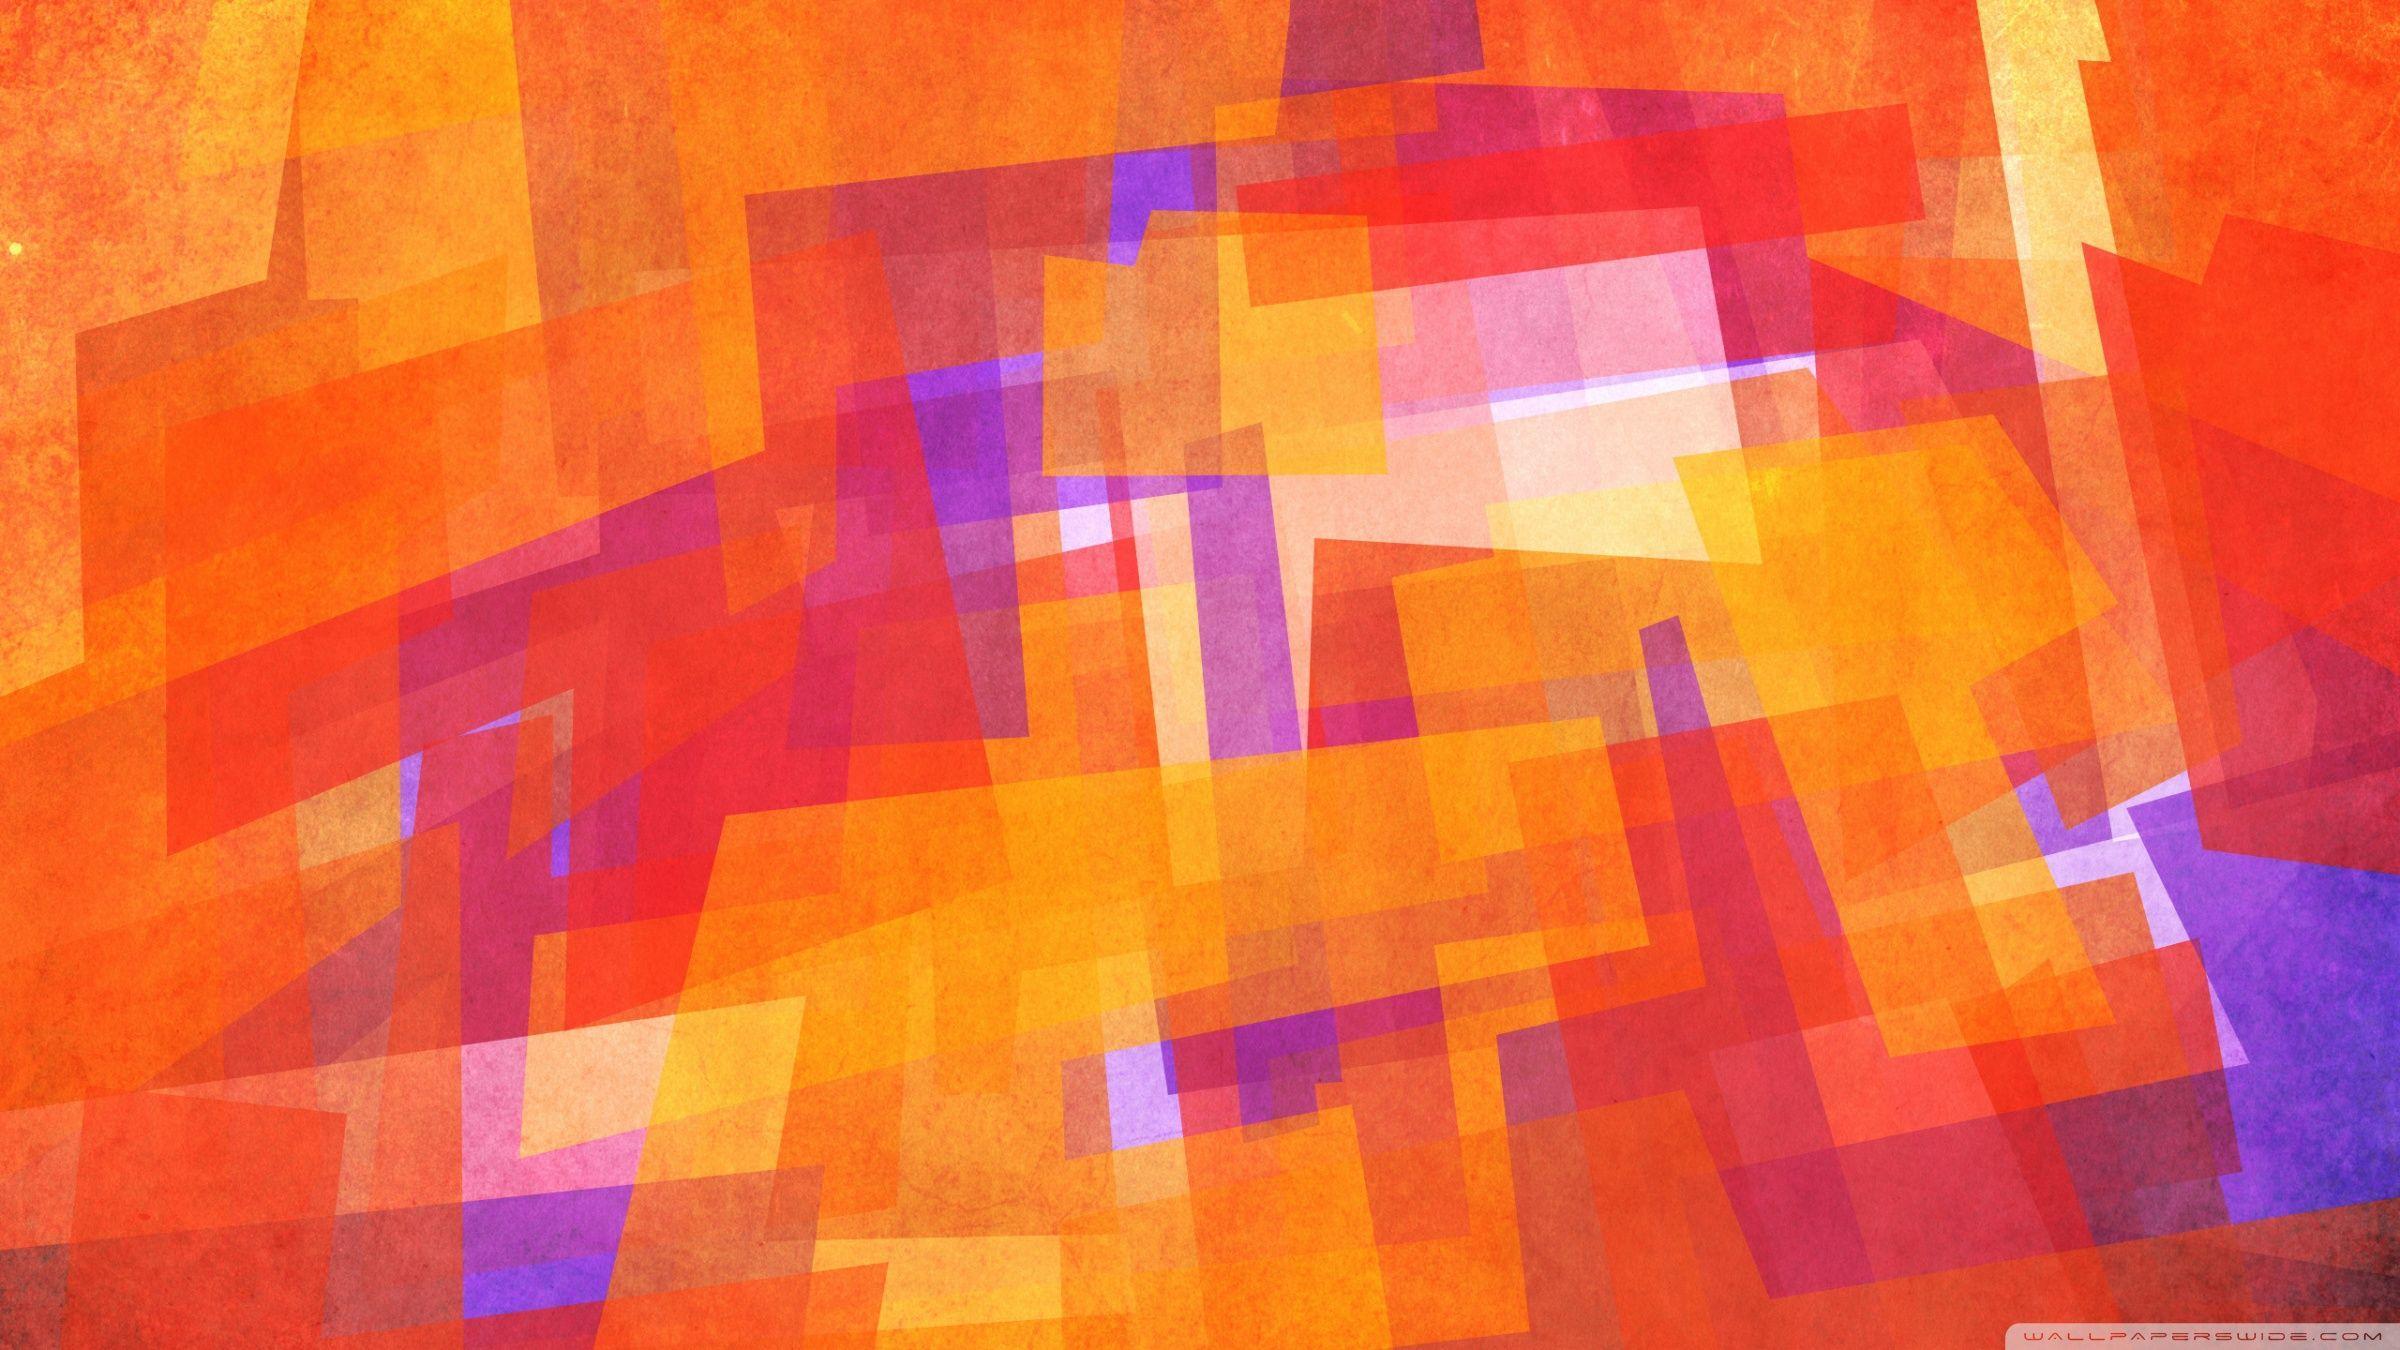 Geometry Hd Desktop Wallpaper High Definition Fullscreen Mobile